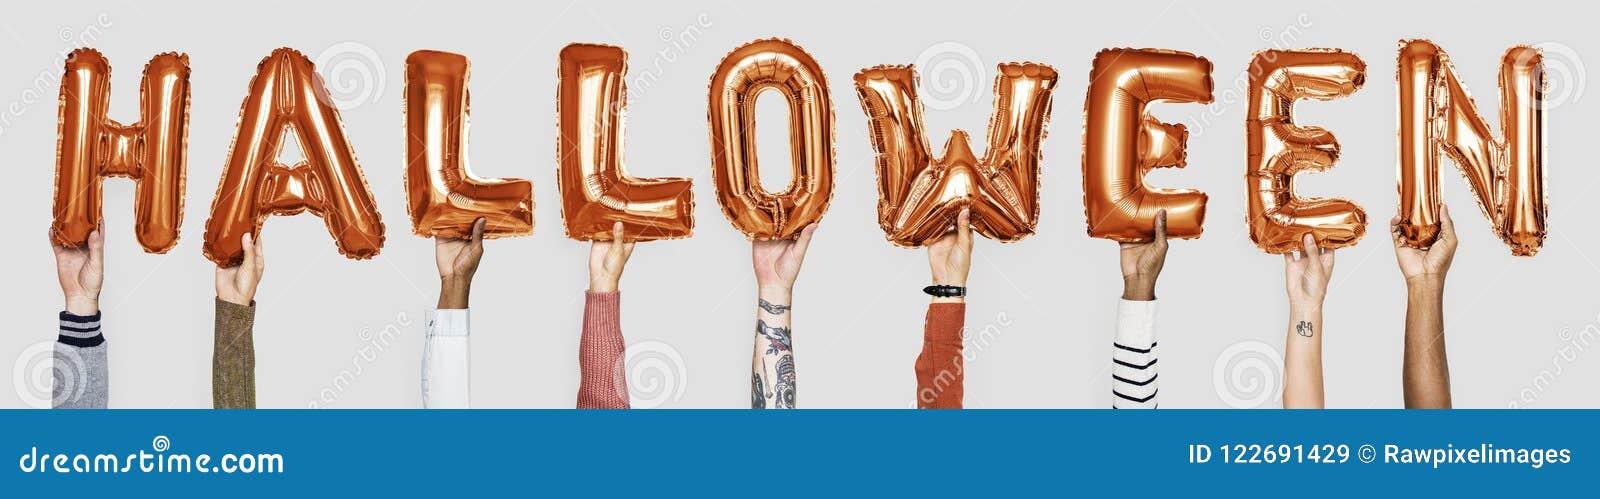 orange alphabet balloons forming the word halloween stock image